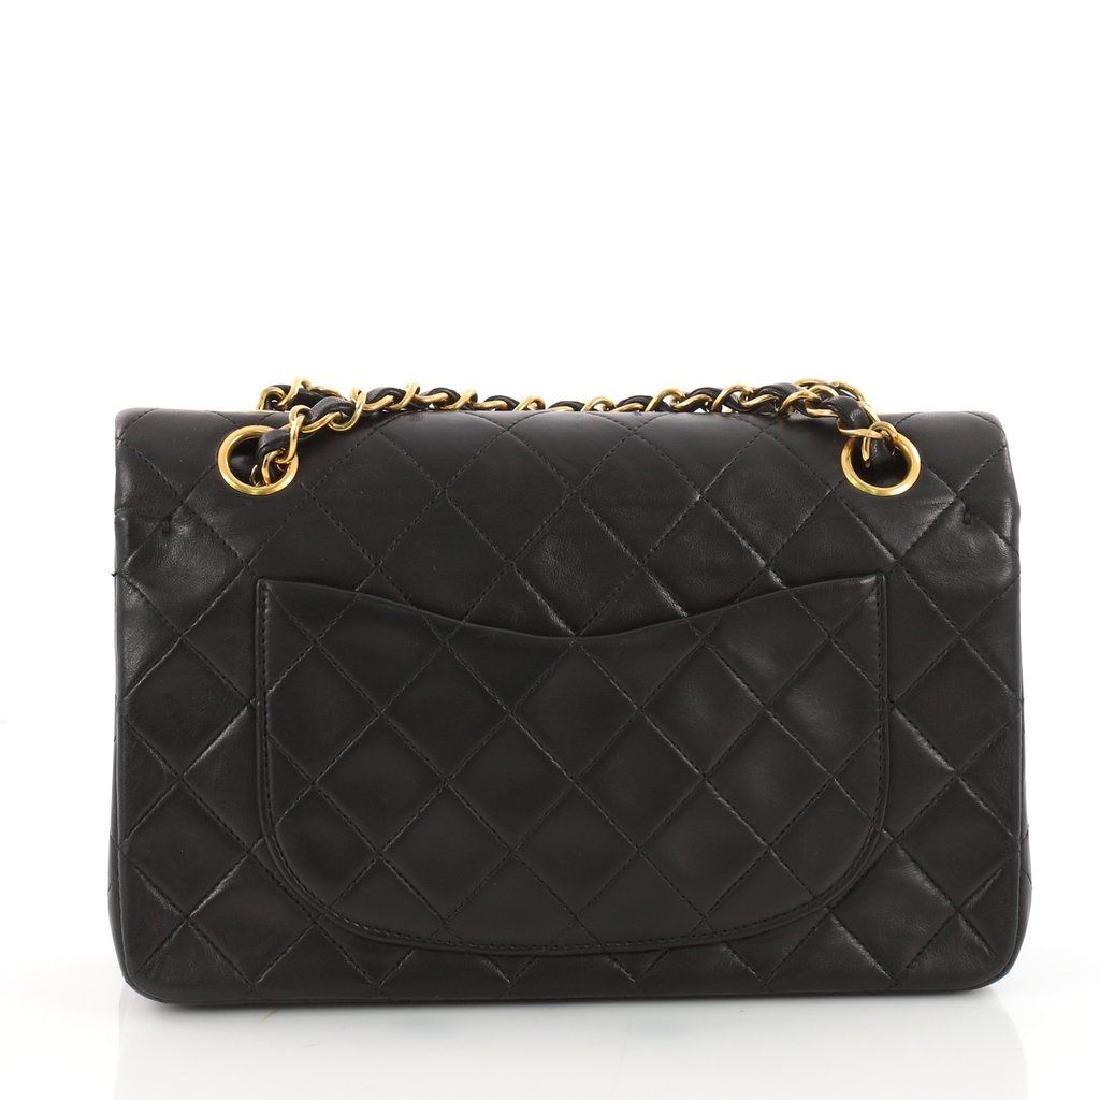 Chanel Double Flap Classic Shoulder Bag Black Lambskin - 3